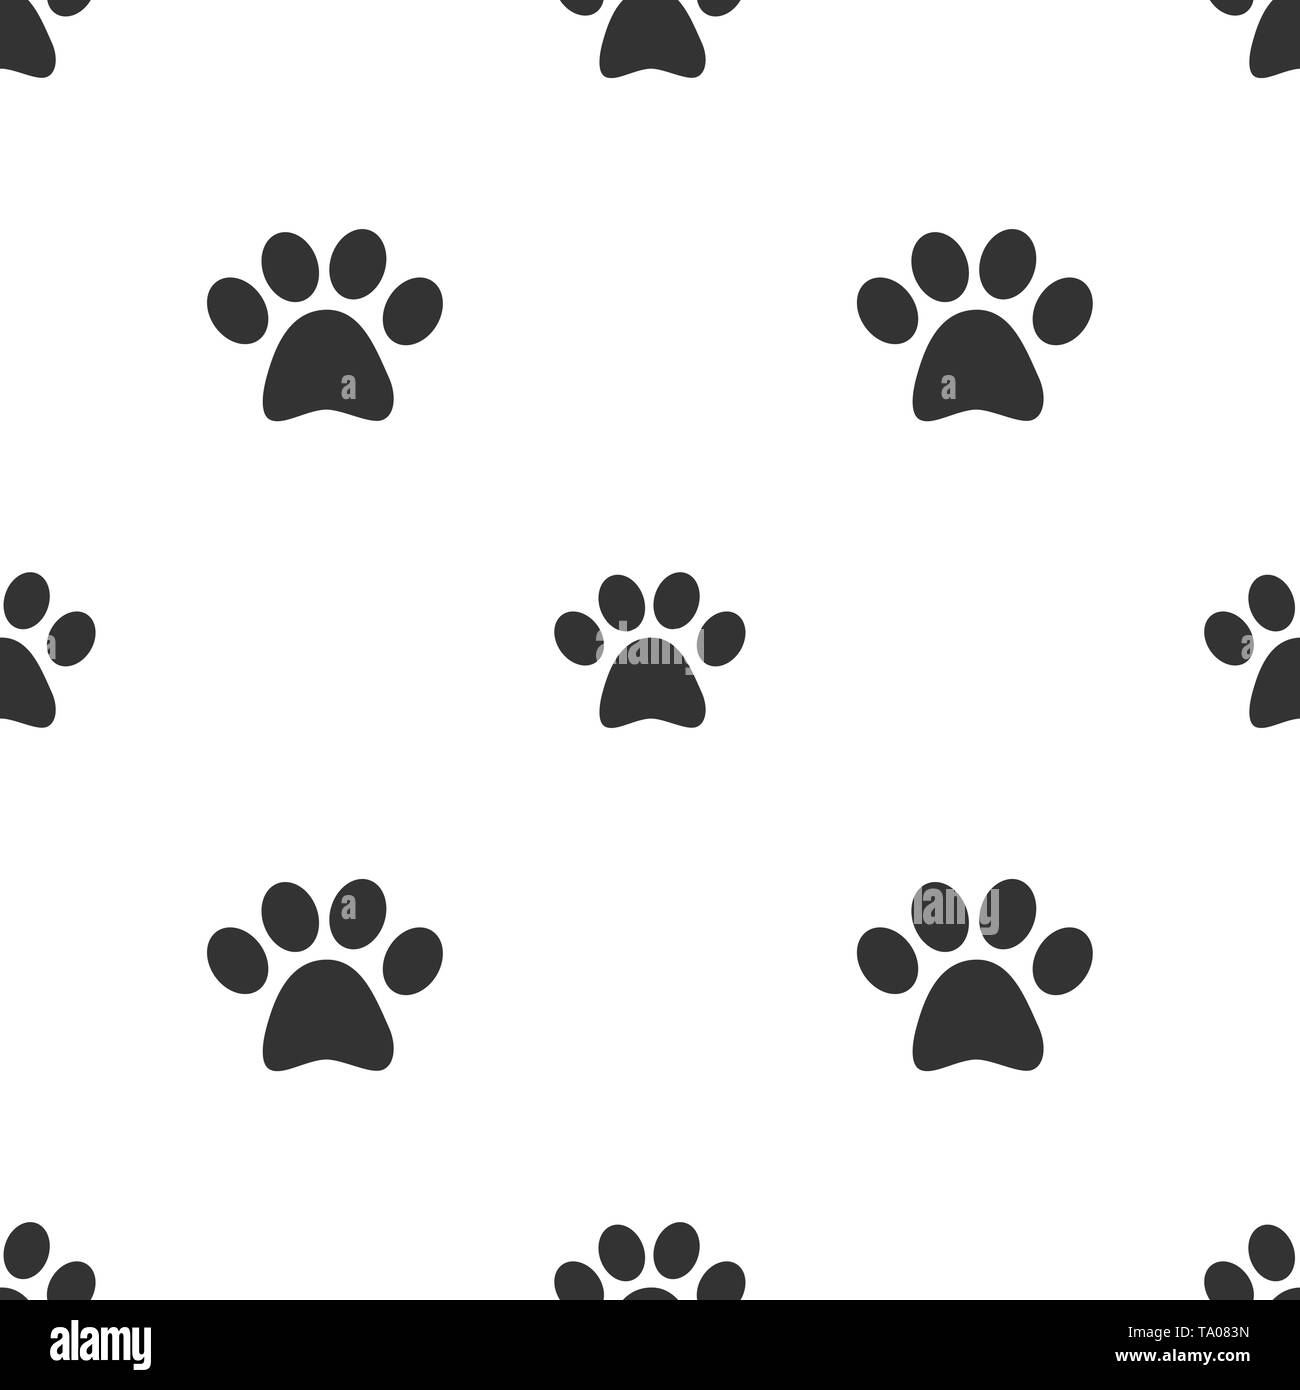 Animal cat or dog footprint seamless pattern - Stock Image